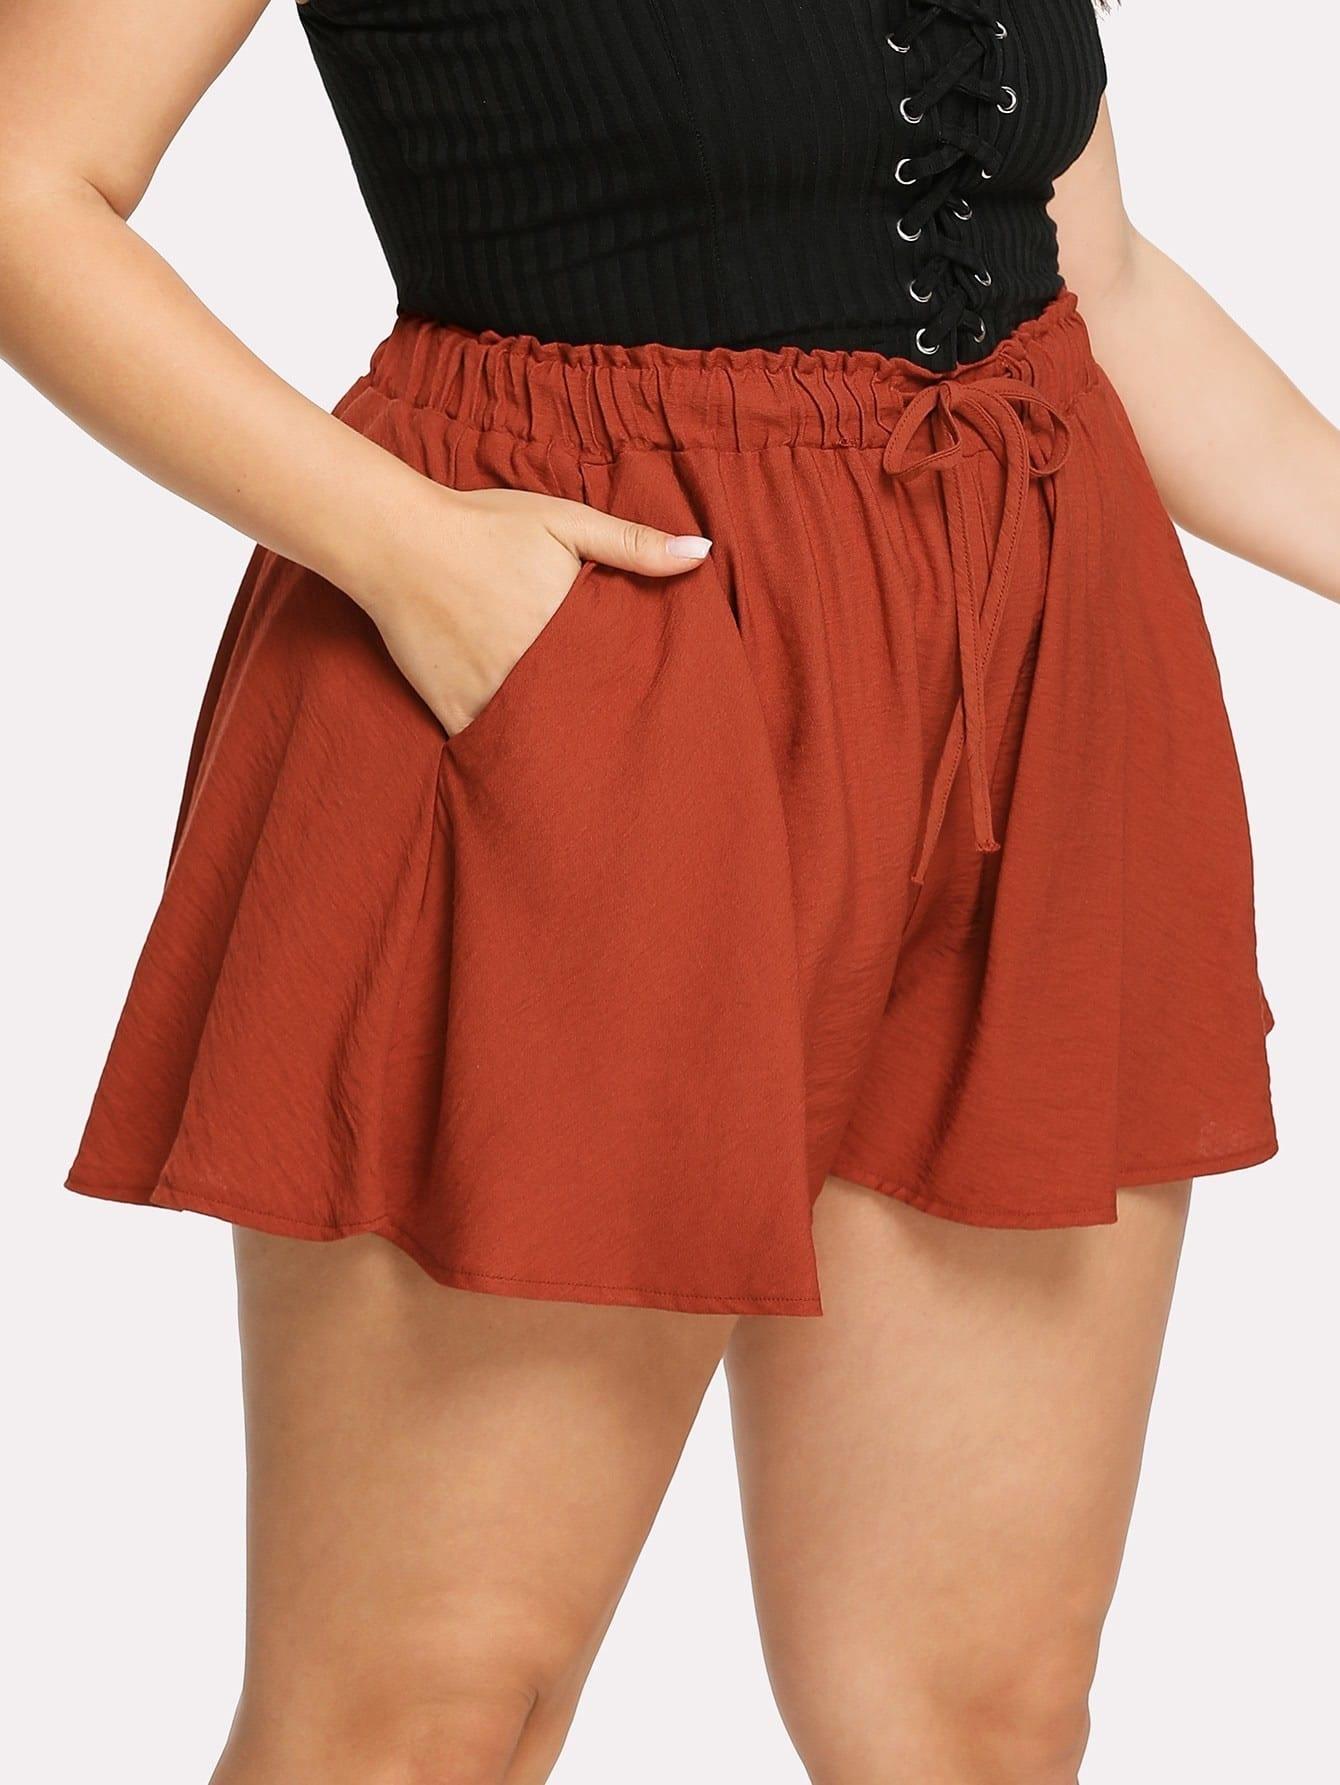 Drawstring Waist Loose Shorts drawstring waist tie dyed shorts